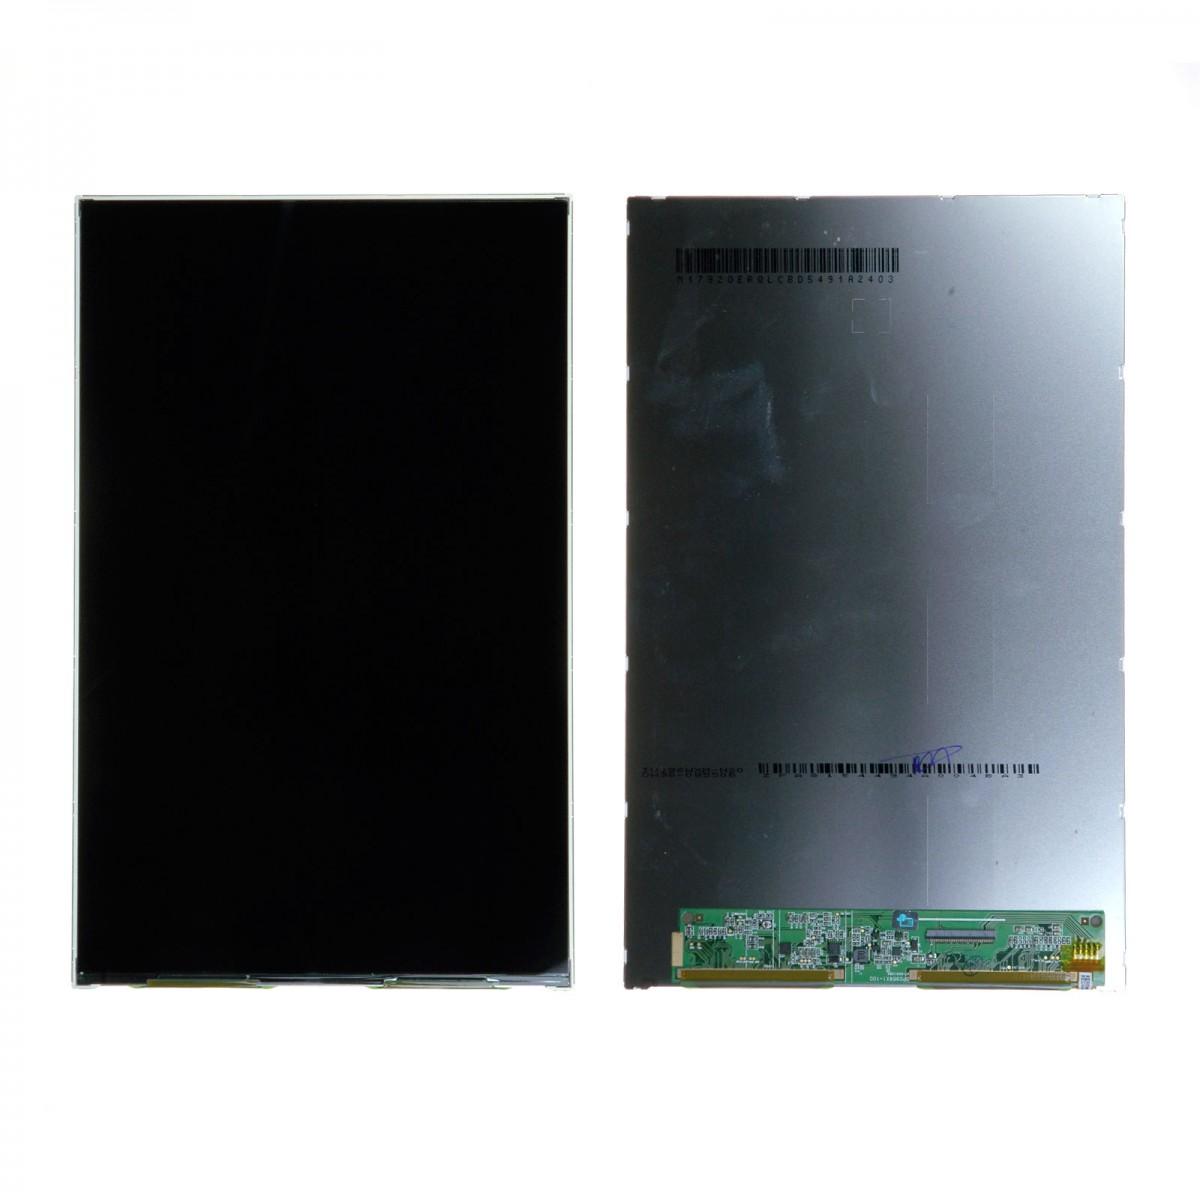 afficheur lcd samsung galaxy tab e 9 6 t560 achat en. Black Bedroom Furniture Sets. Home Design Ideas